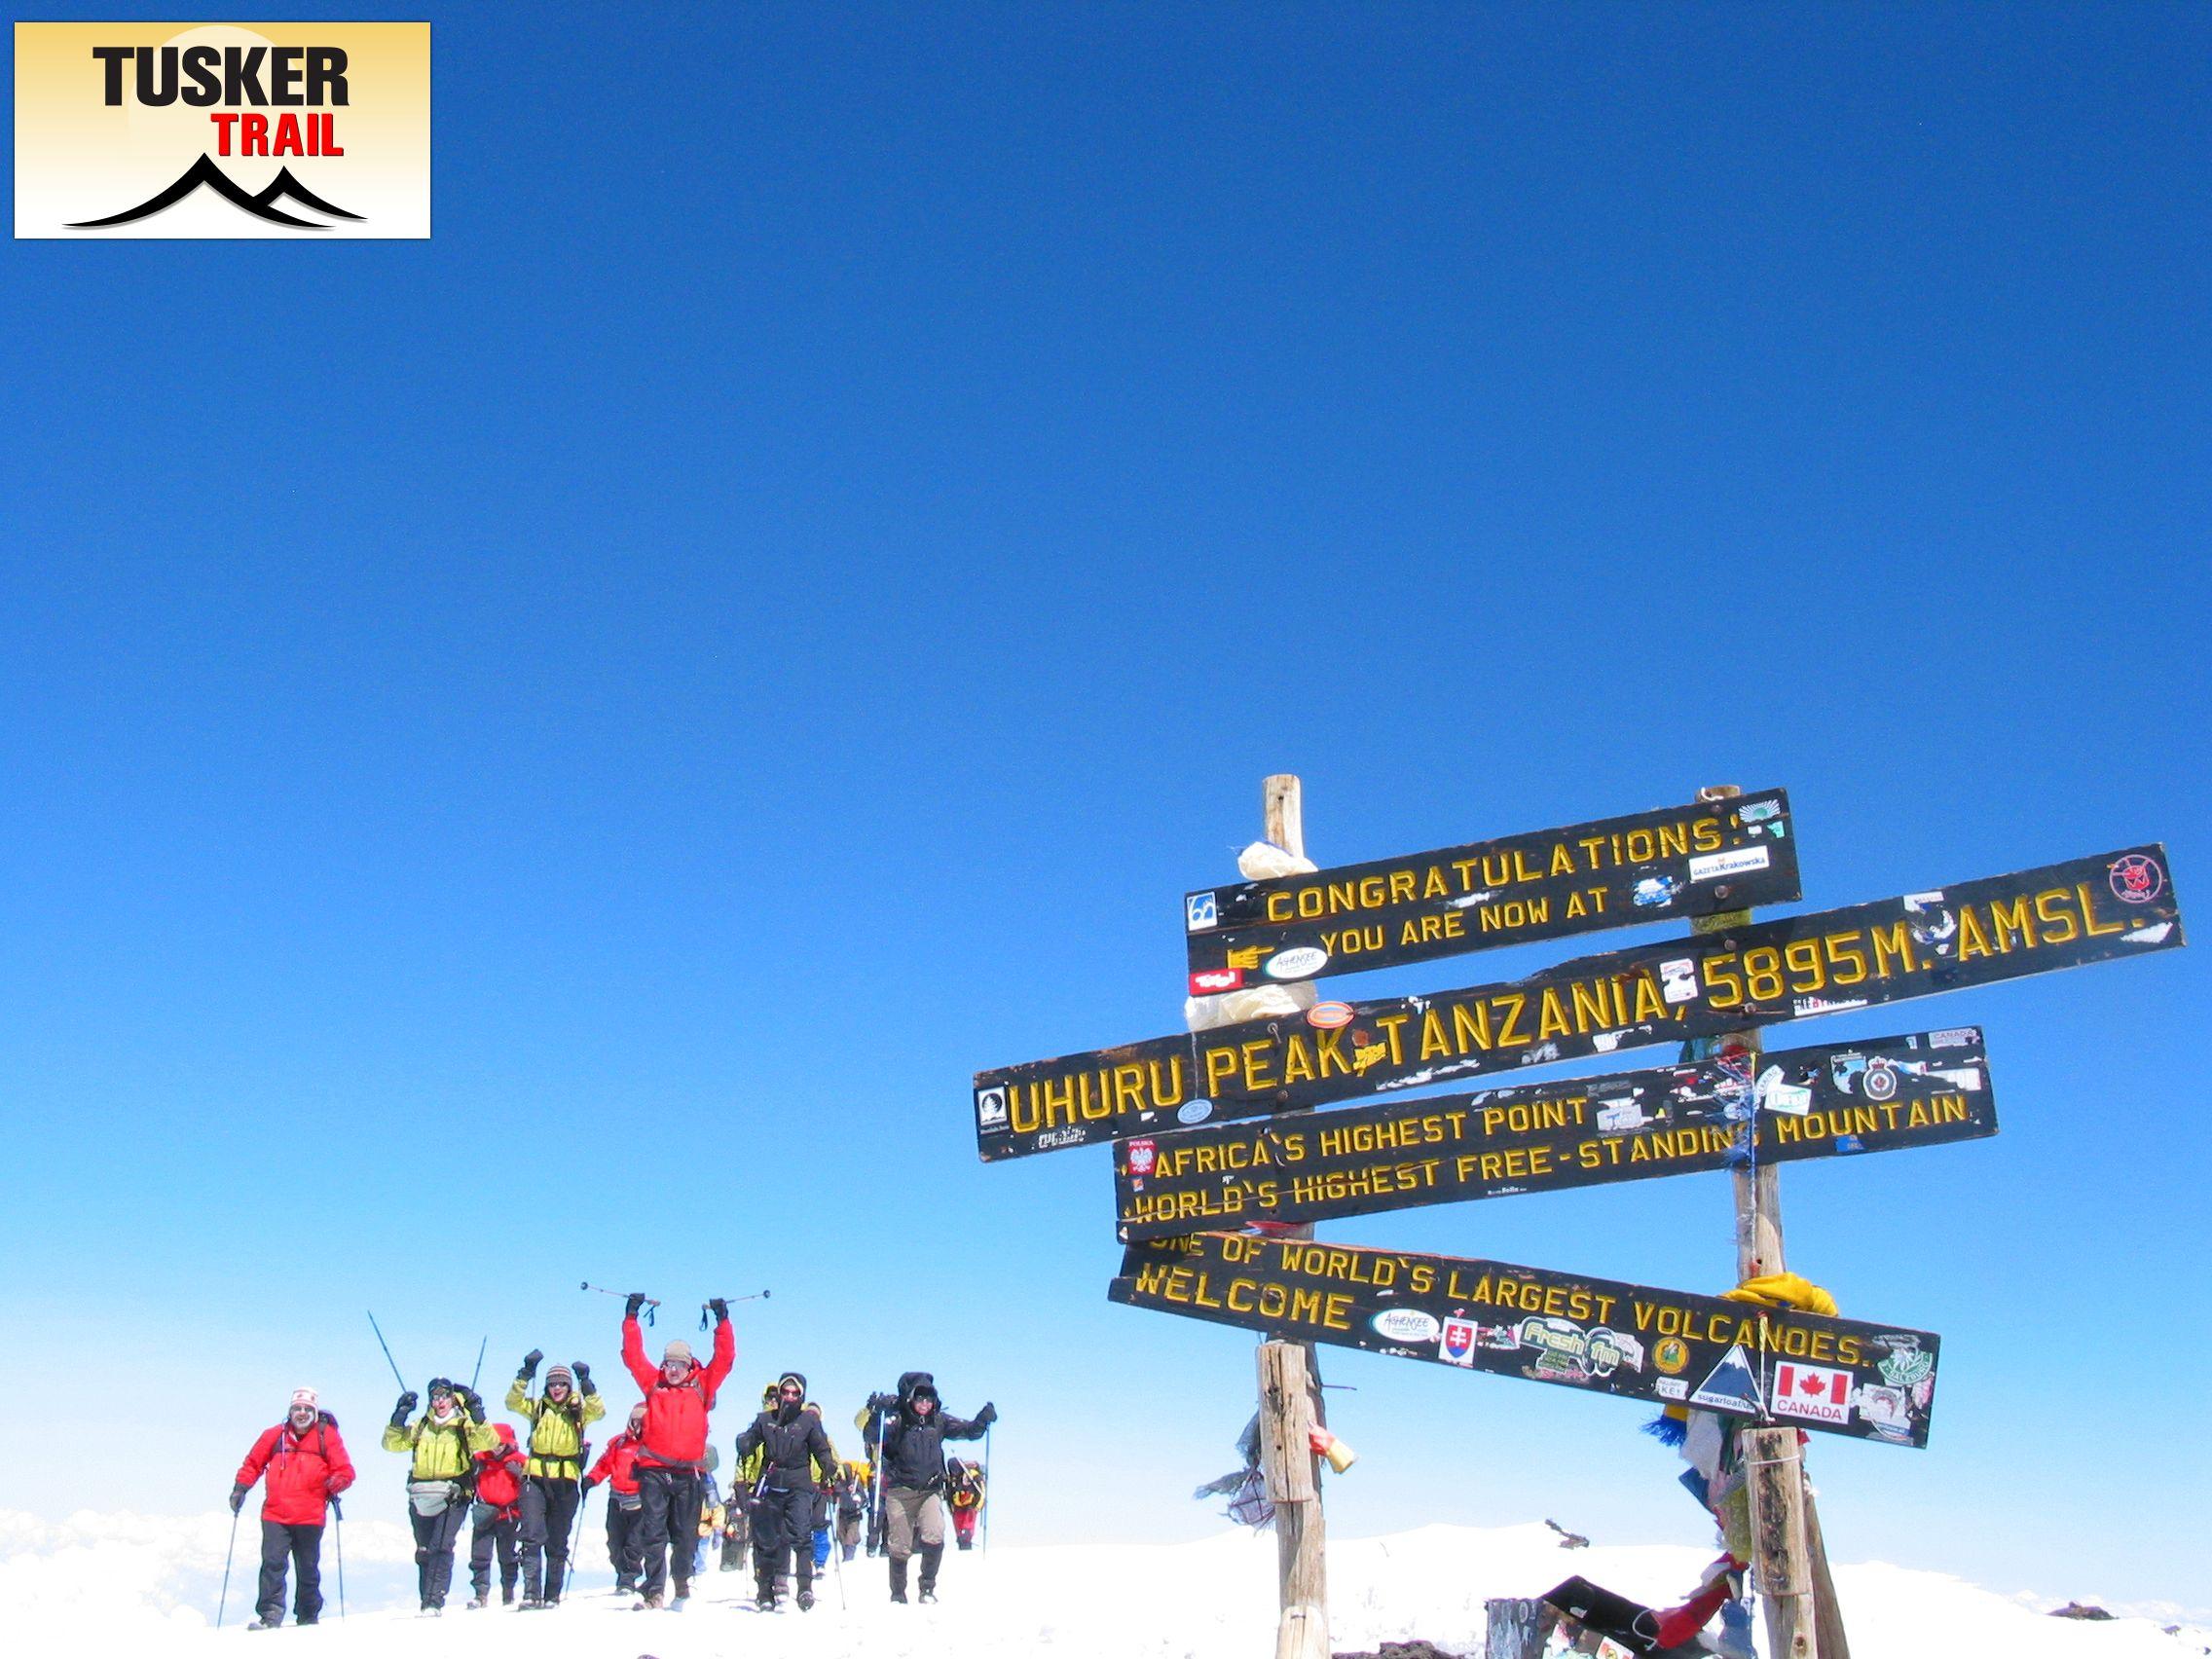 Approaching the Summit Uhuru Peak., Mount Kilimanjaro